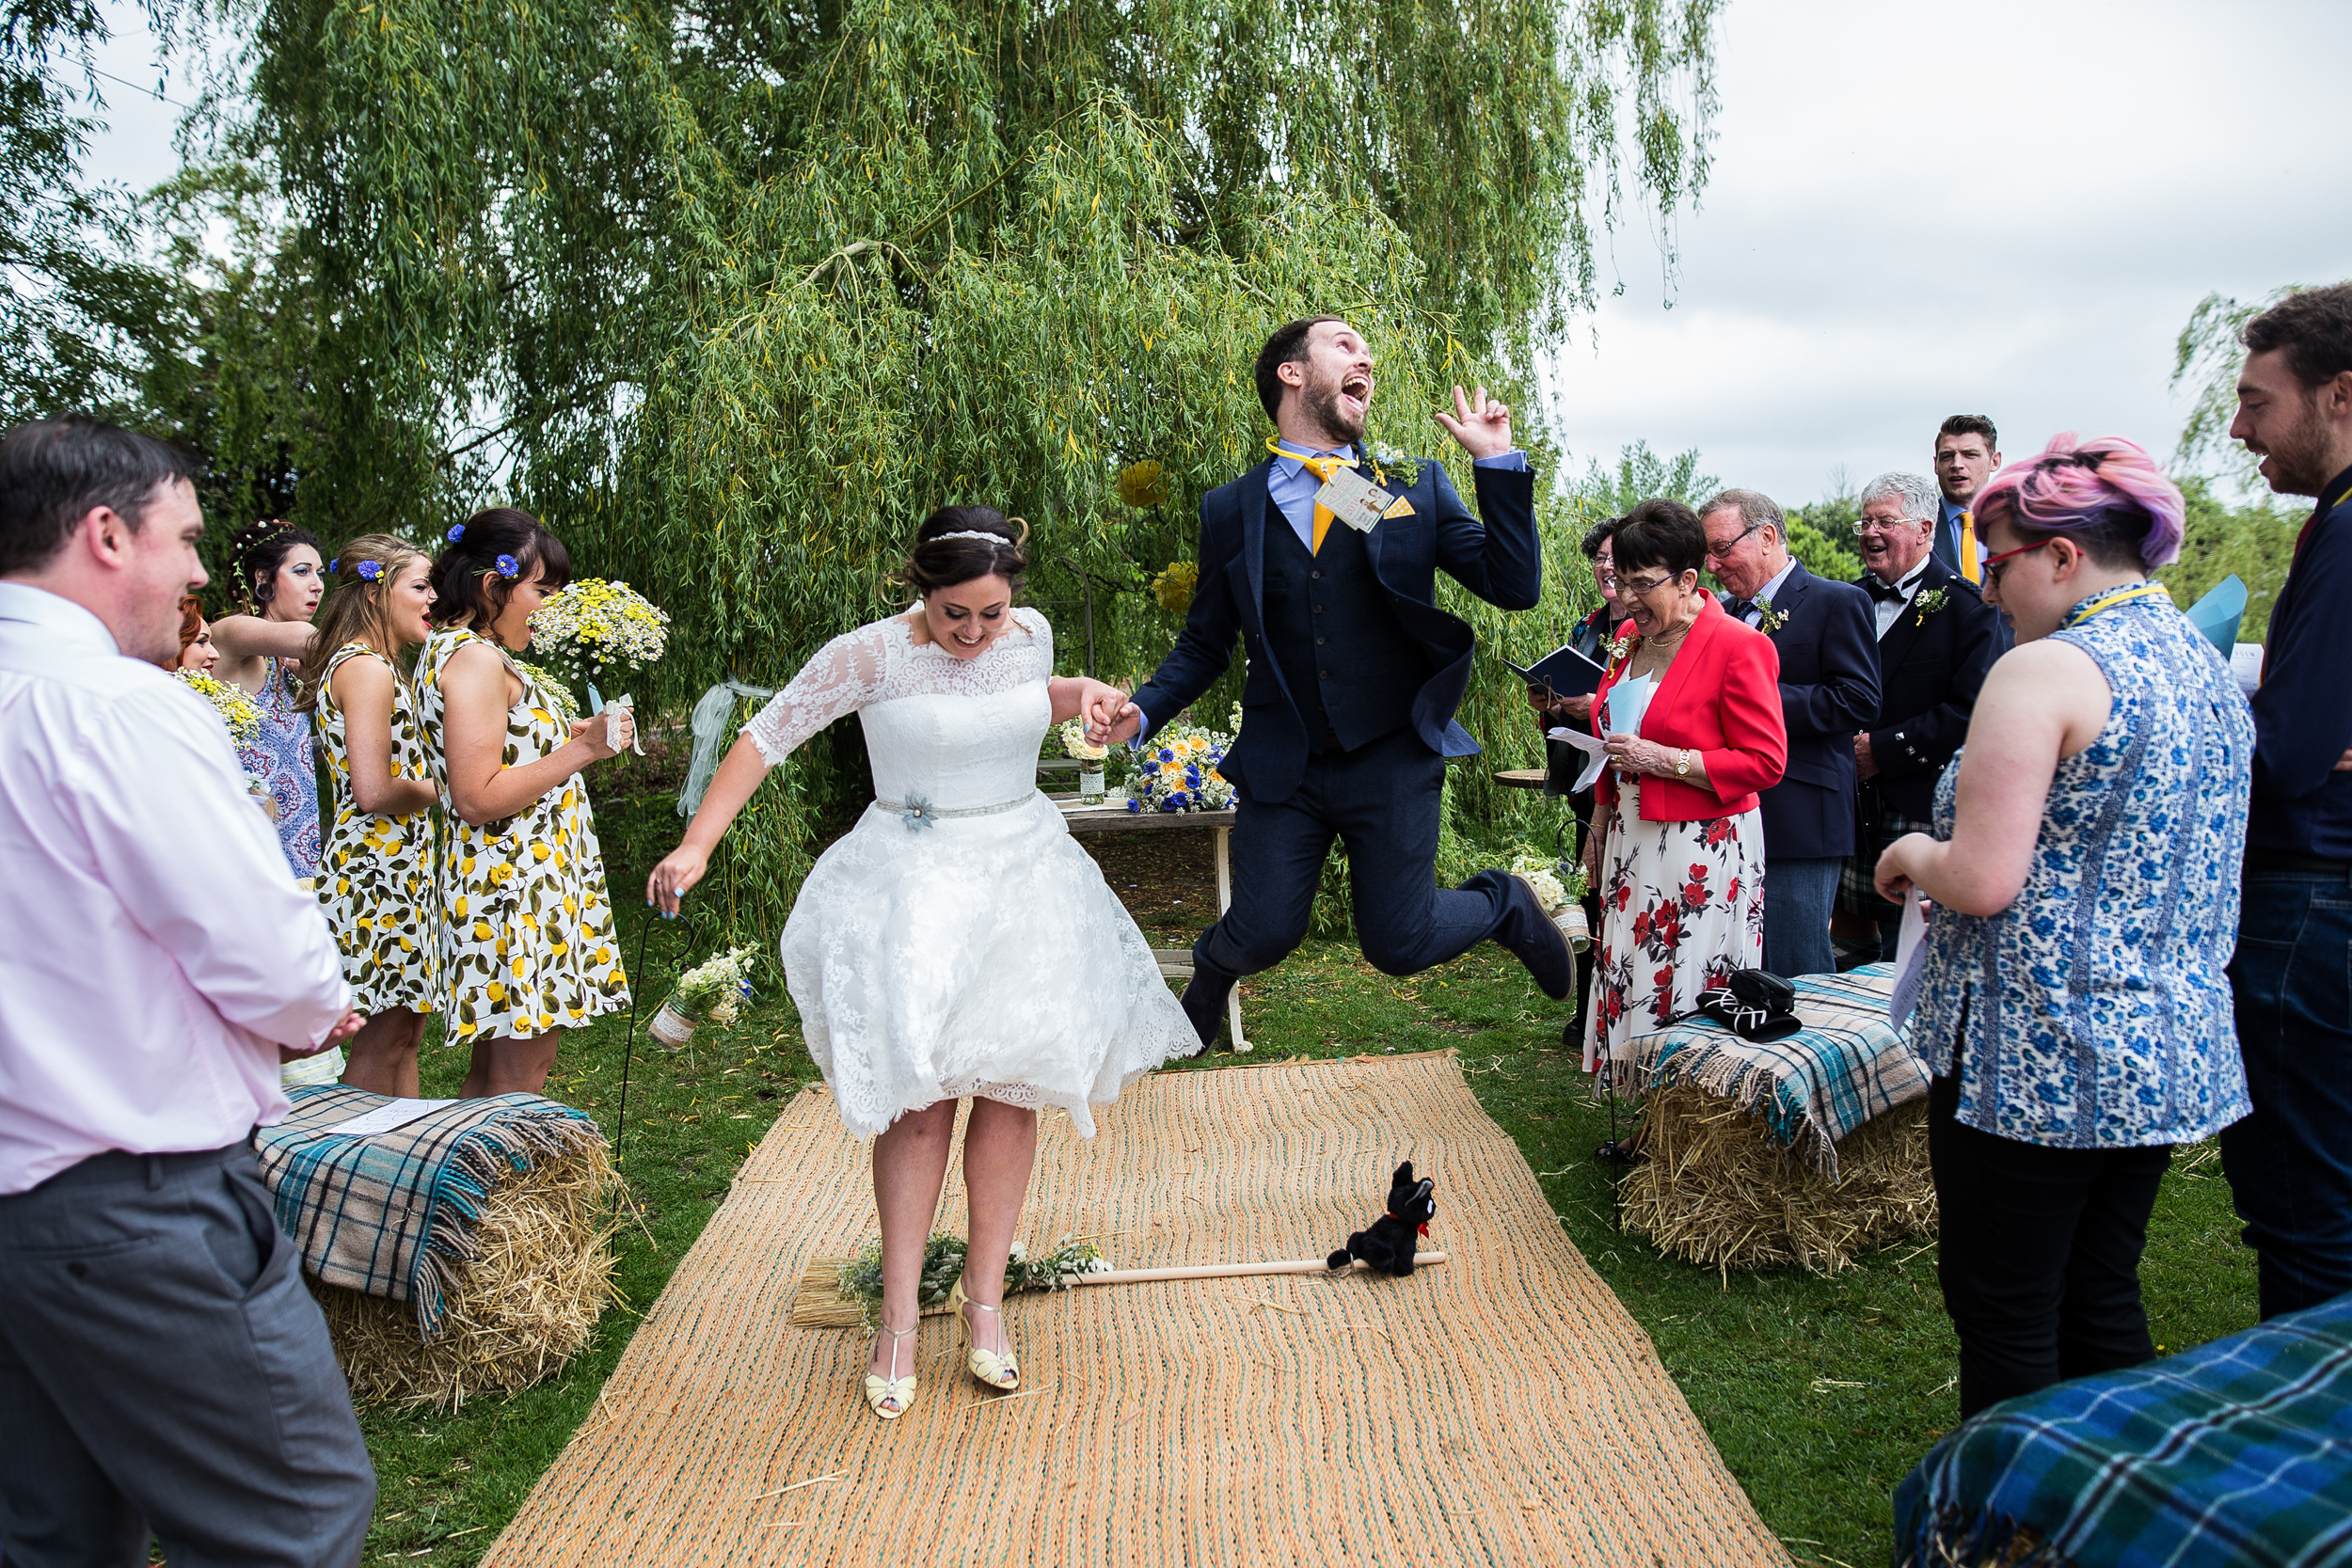 creative-wedding-photography-teesside-north-east-yorkshire-137.jpg